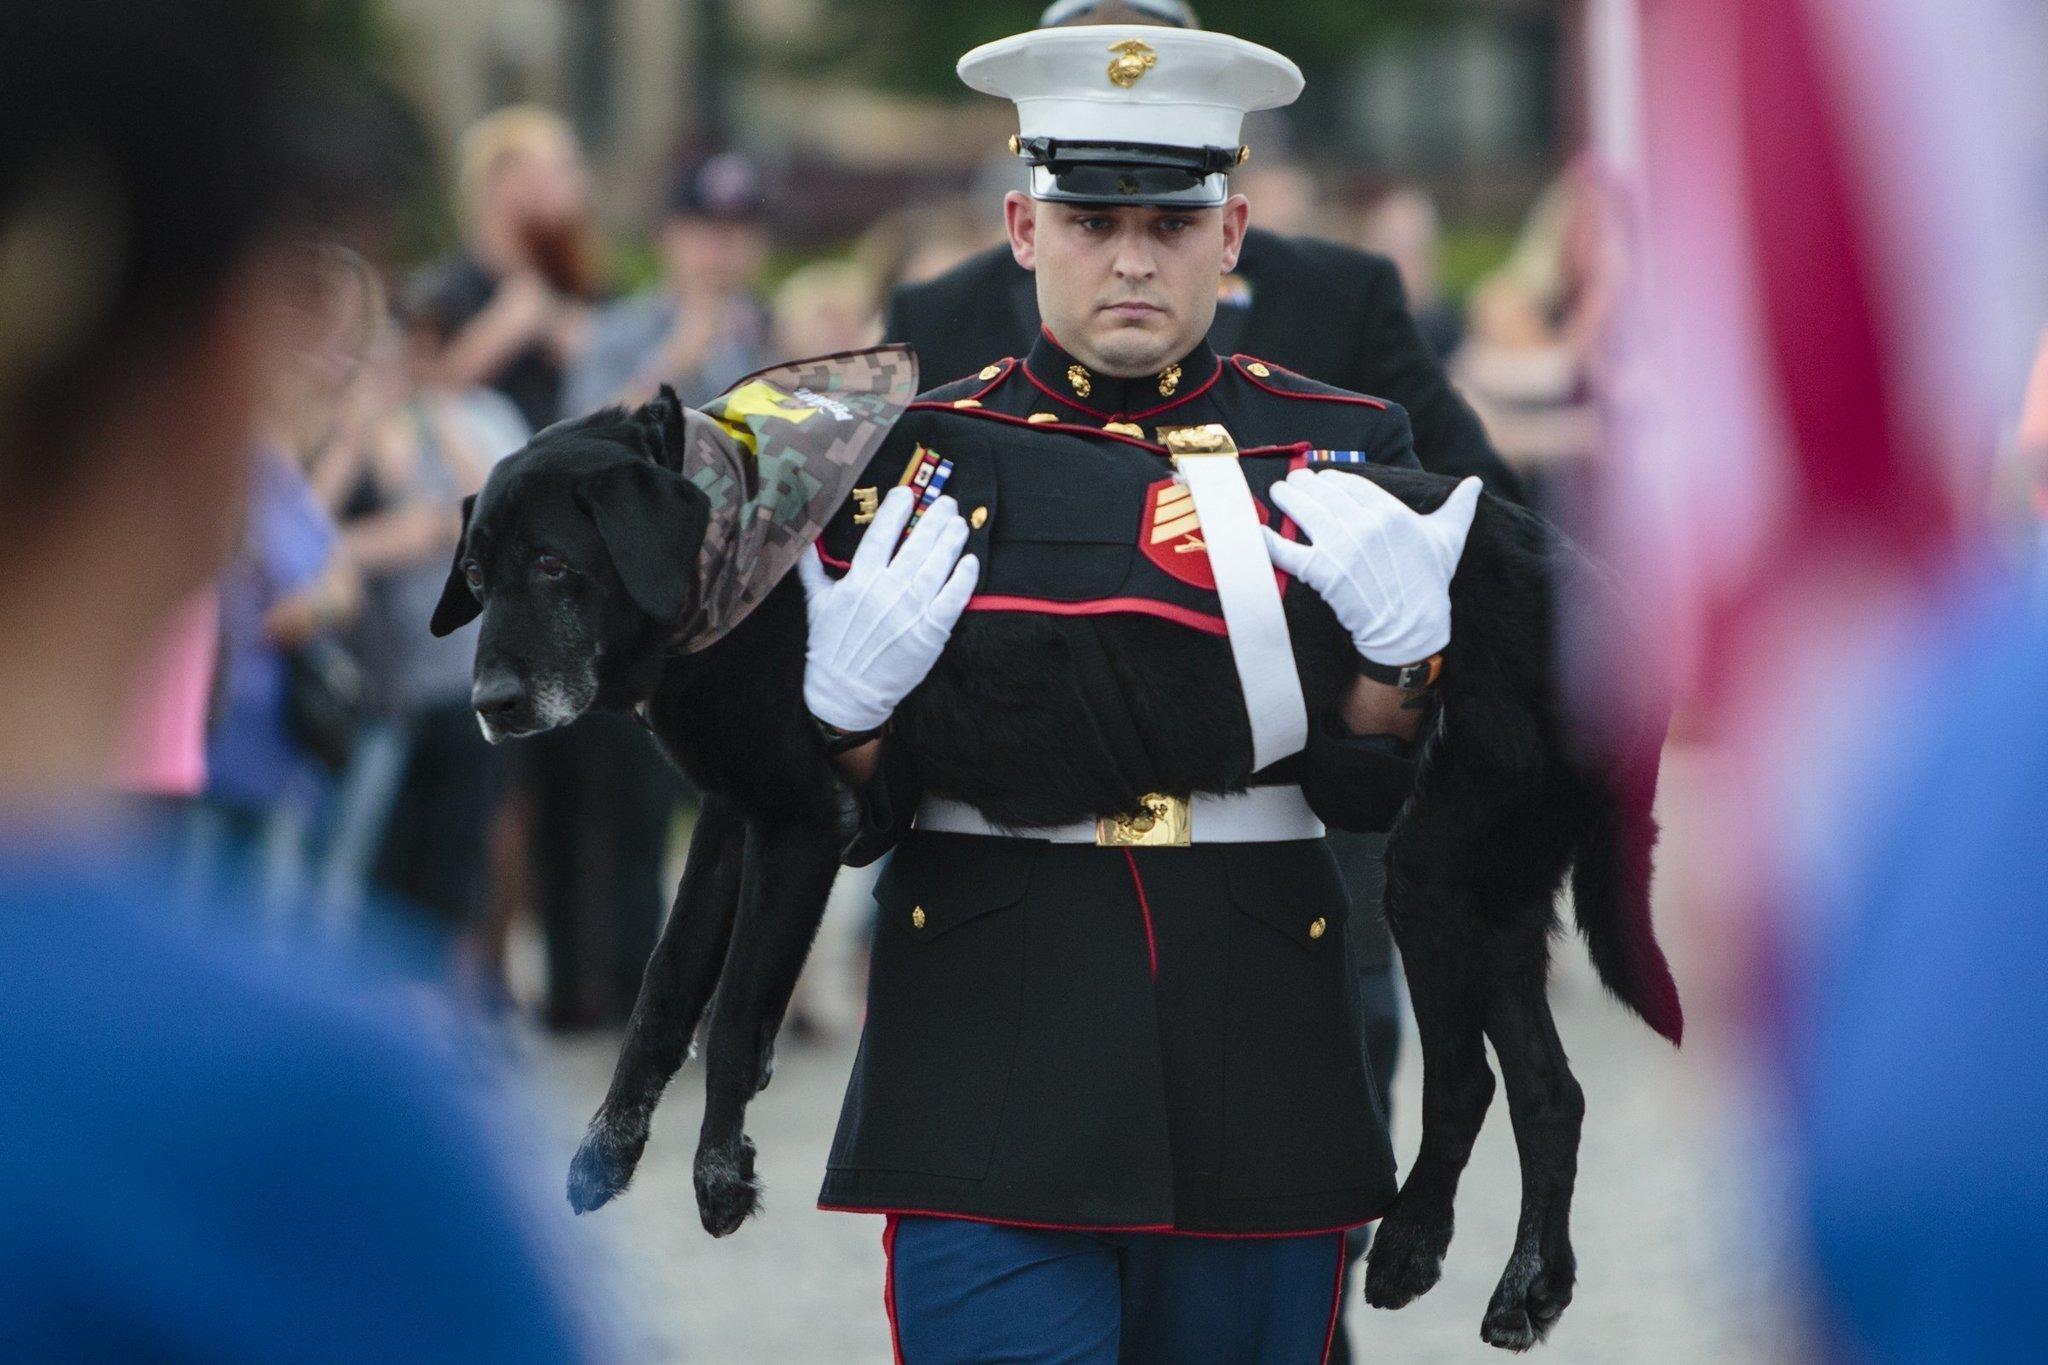 marine dog with cancer gets tear